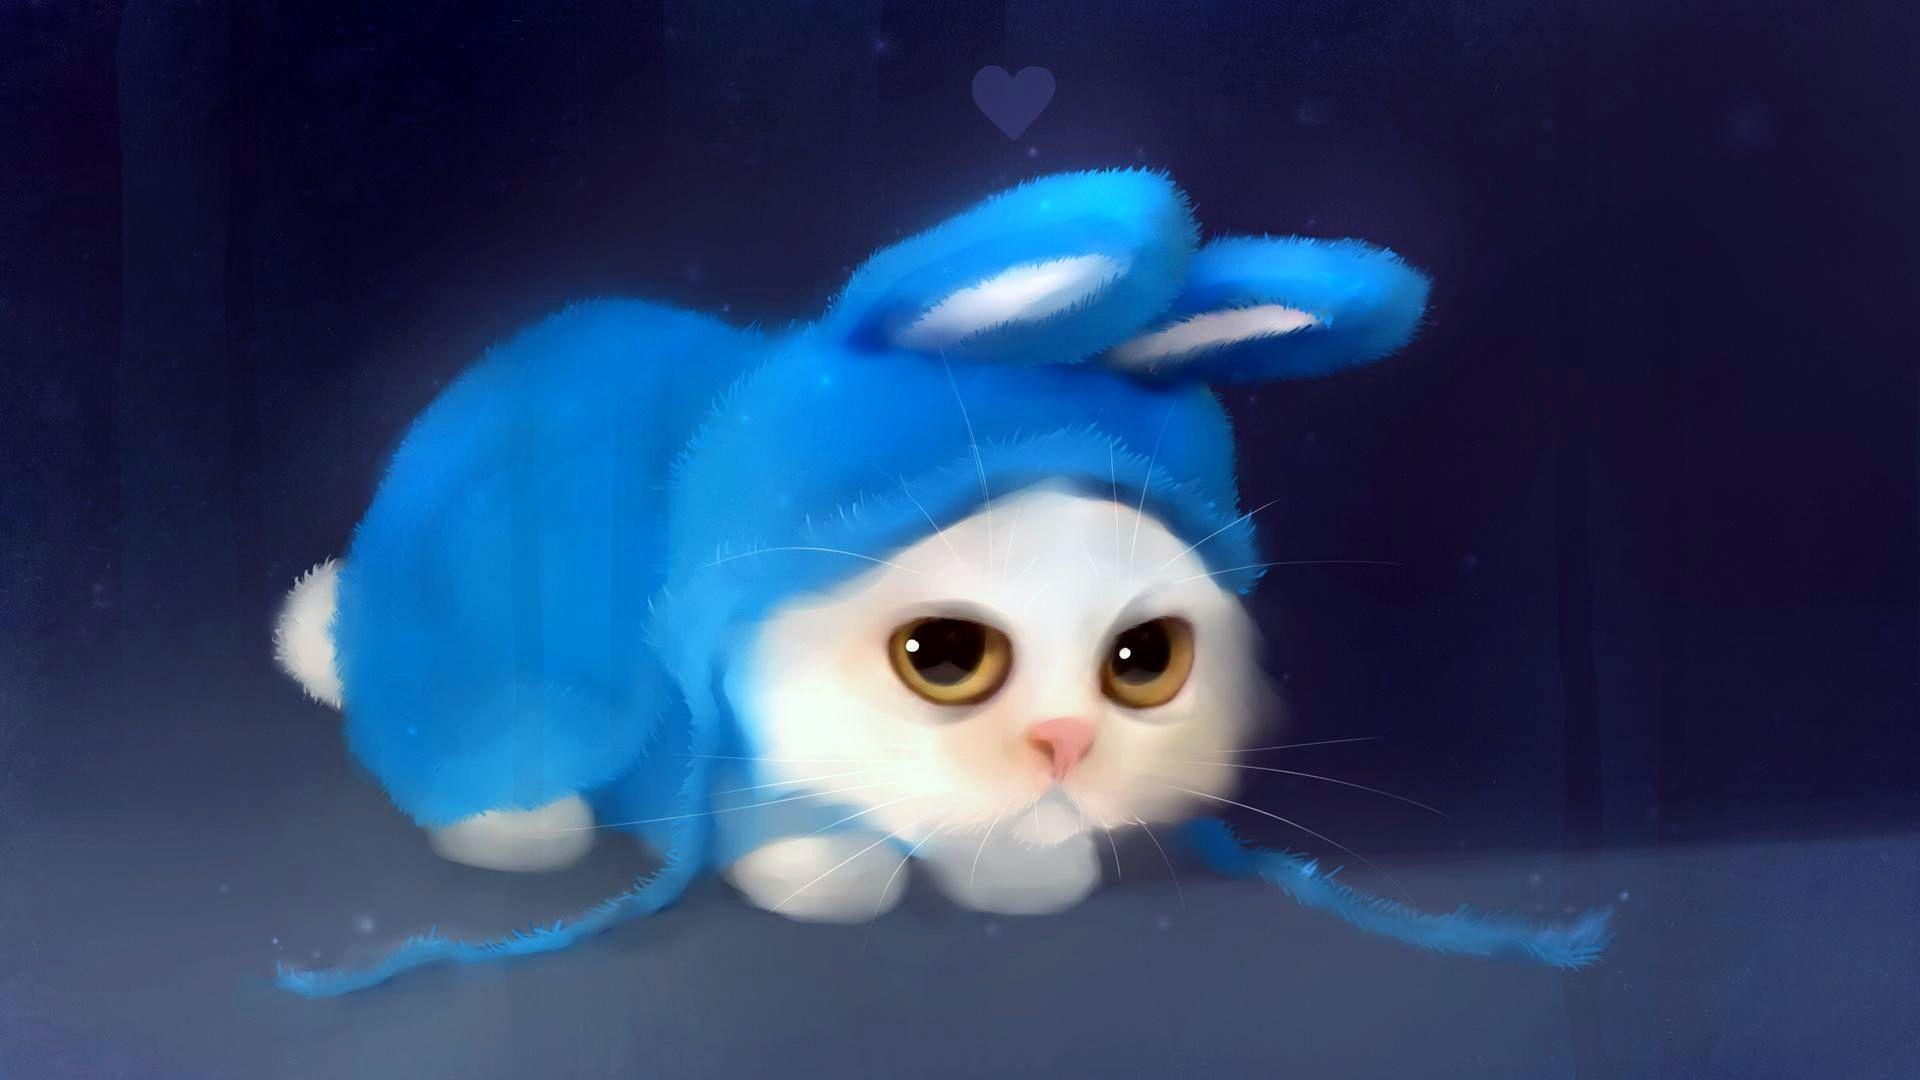 Cute 3d cat desktop image   HD Wallpapers 1920x1080